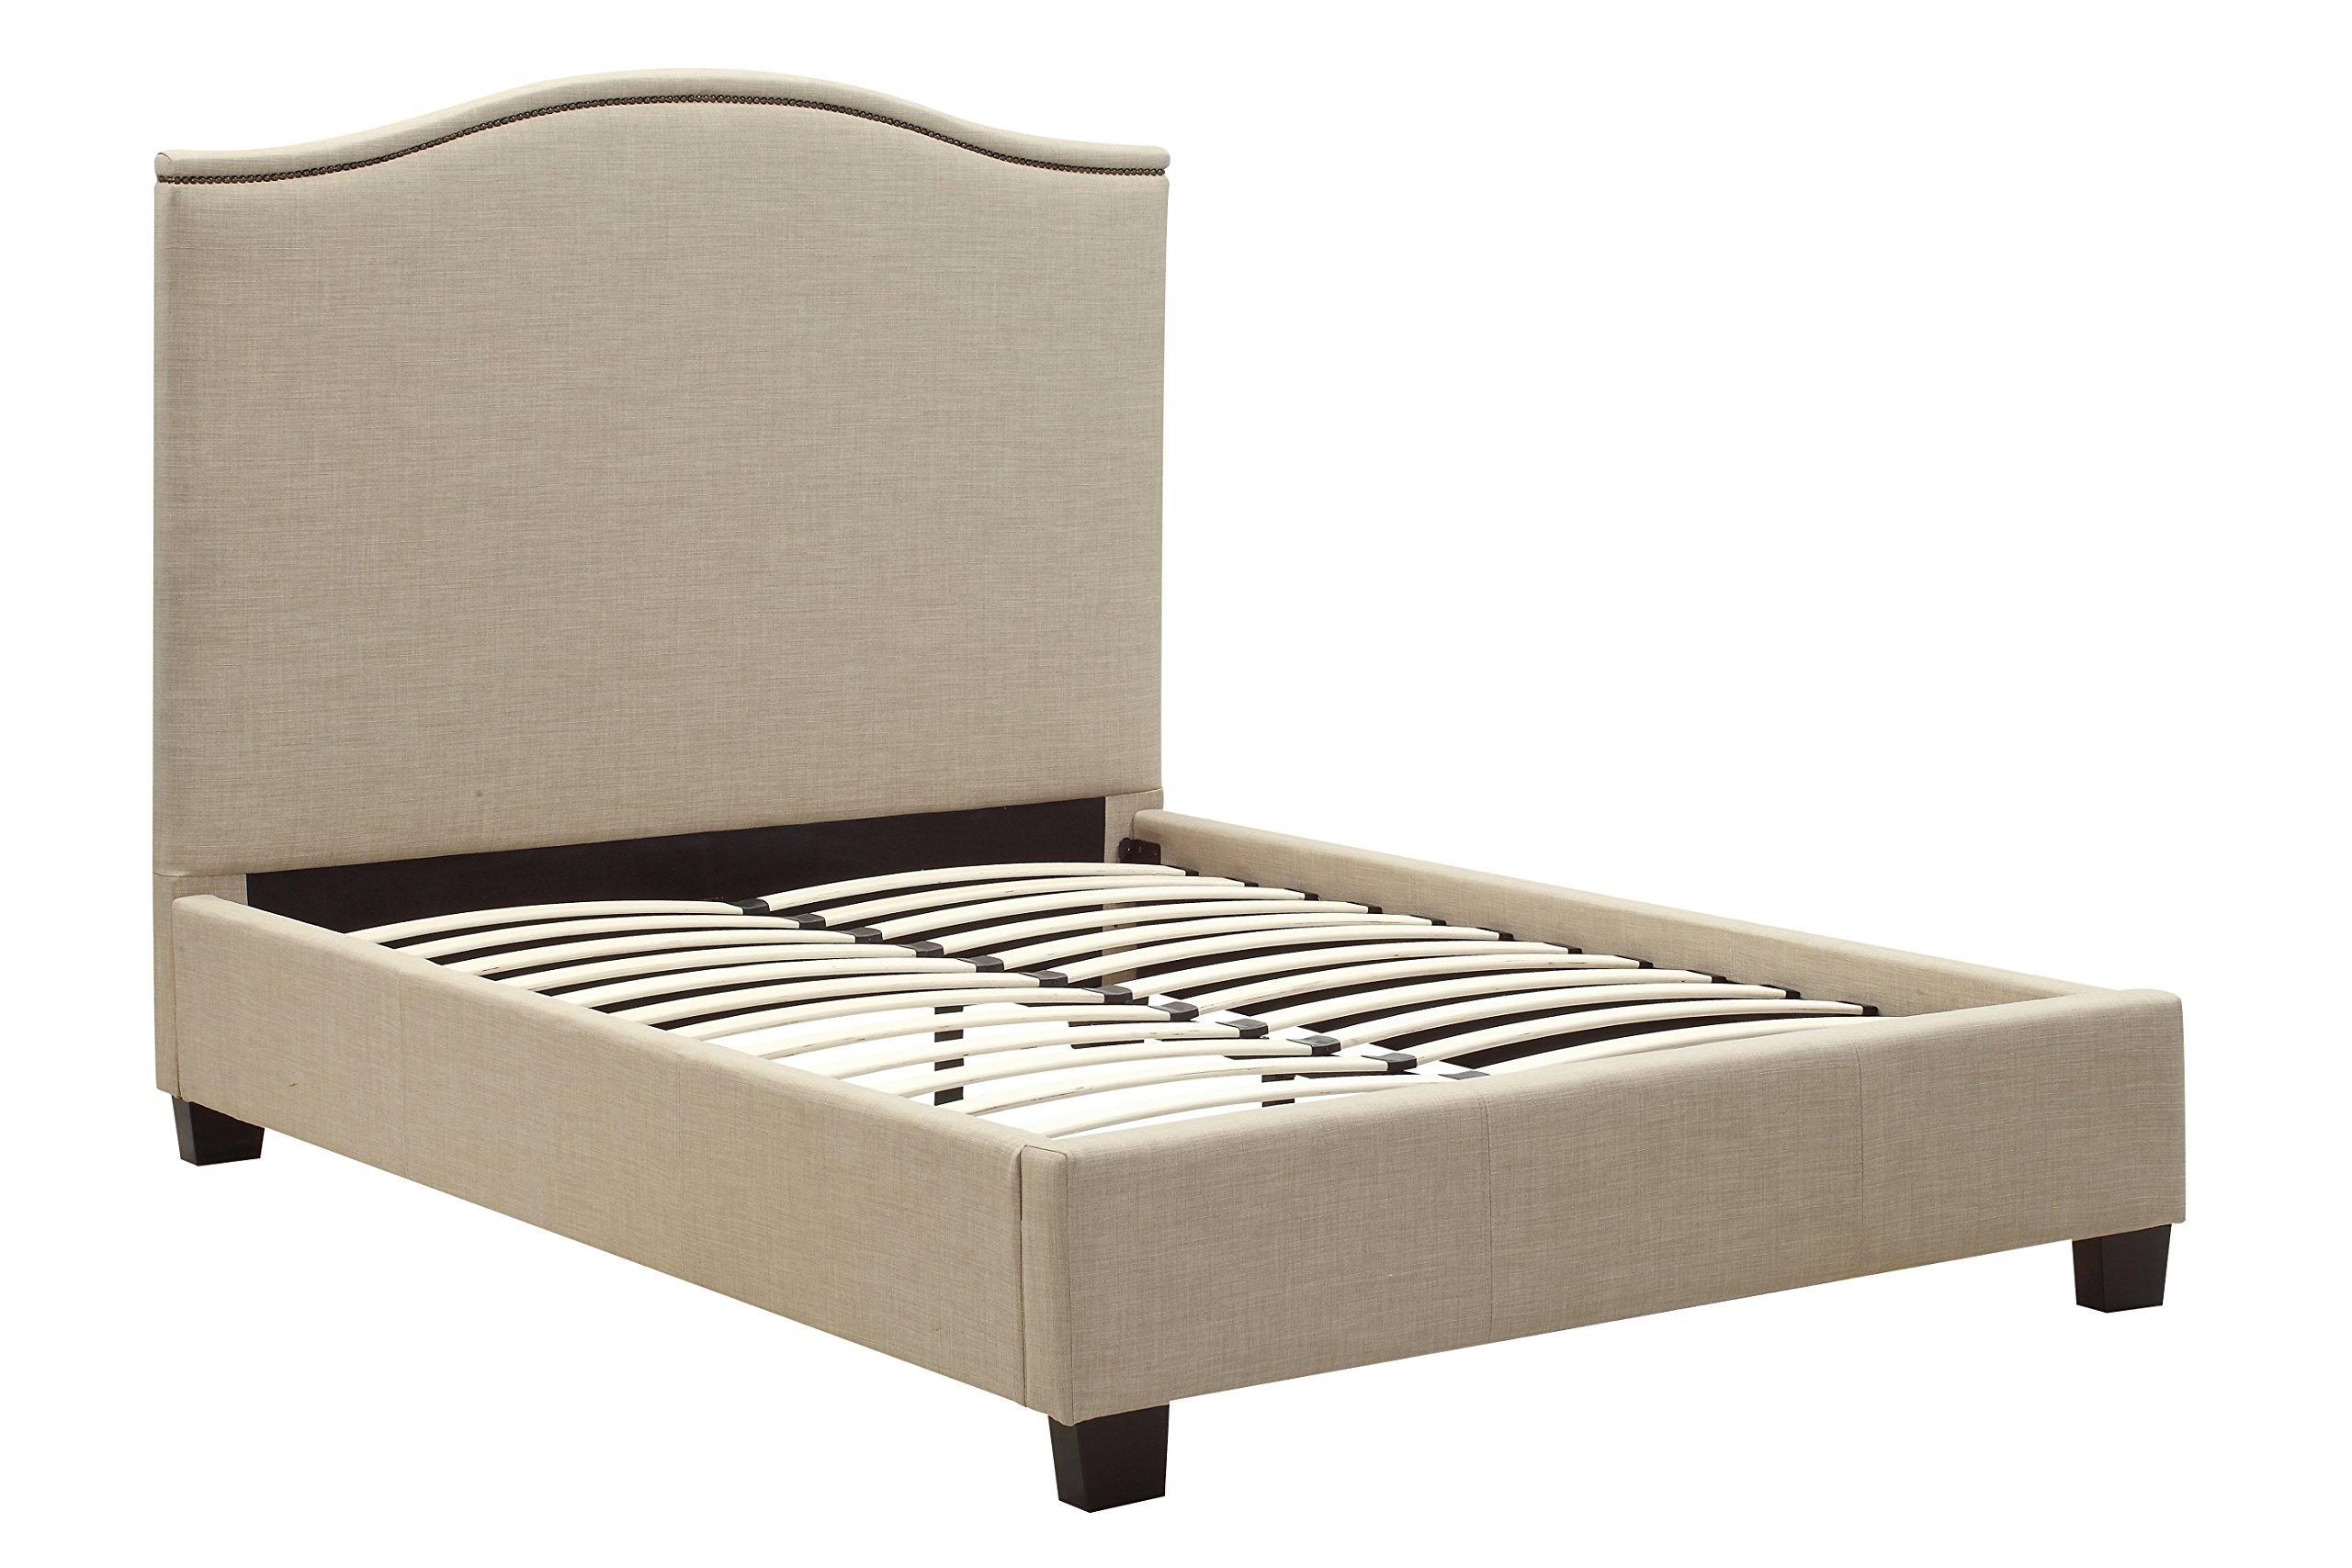 Modus Furniture 3ZL7L7BH2 Gervais Camelback Headboard, King, Espresso